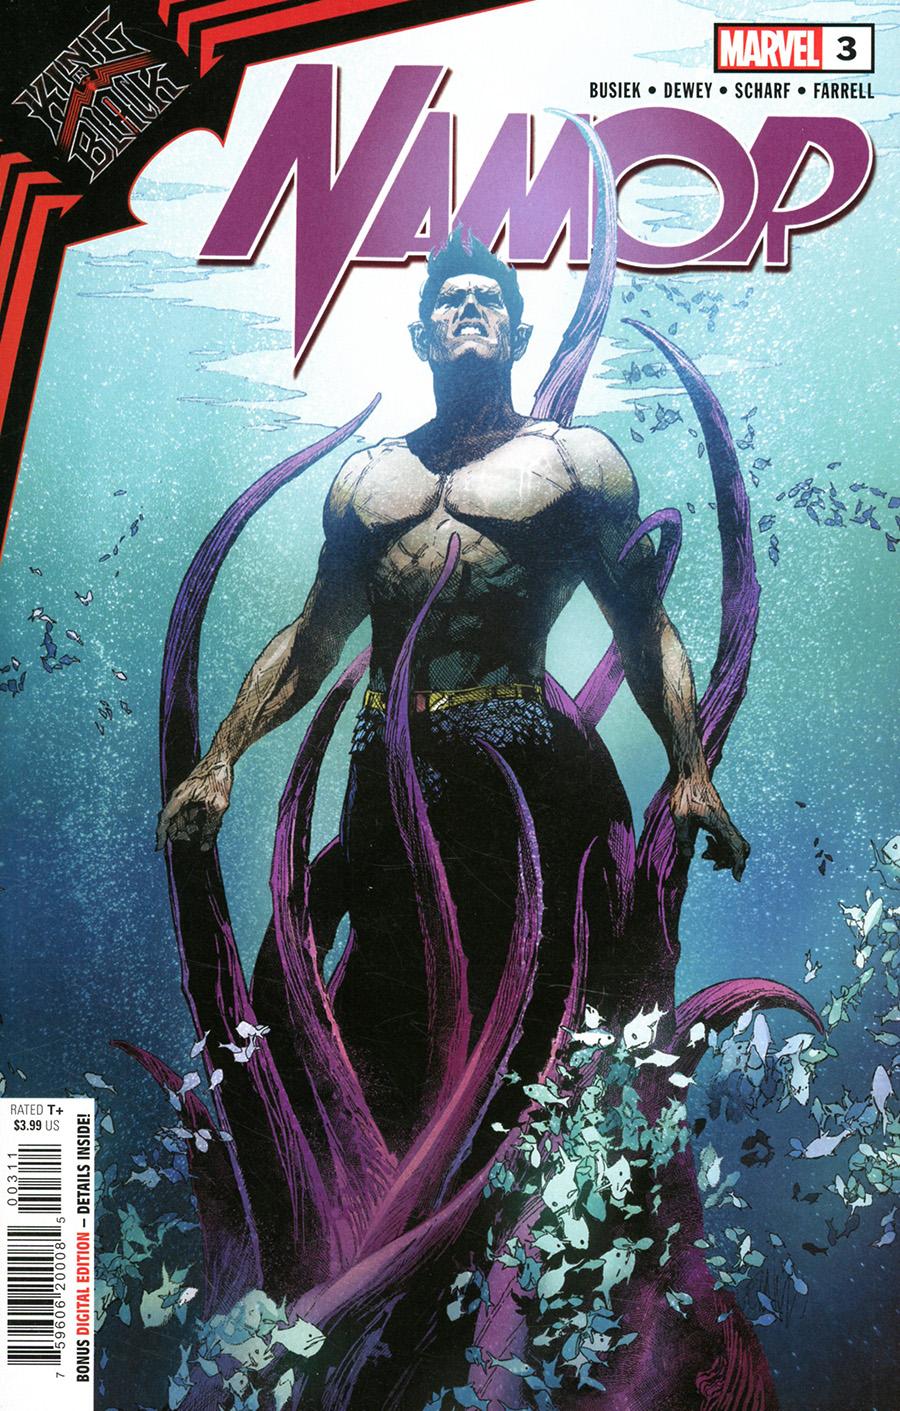 King In Black Namor #3 Cover A Regular Leinil Francis Yu Cover